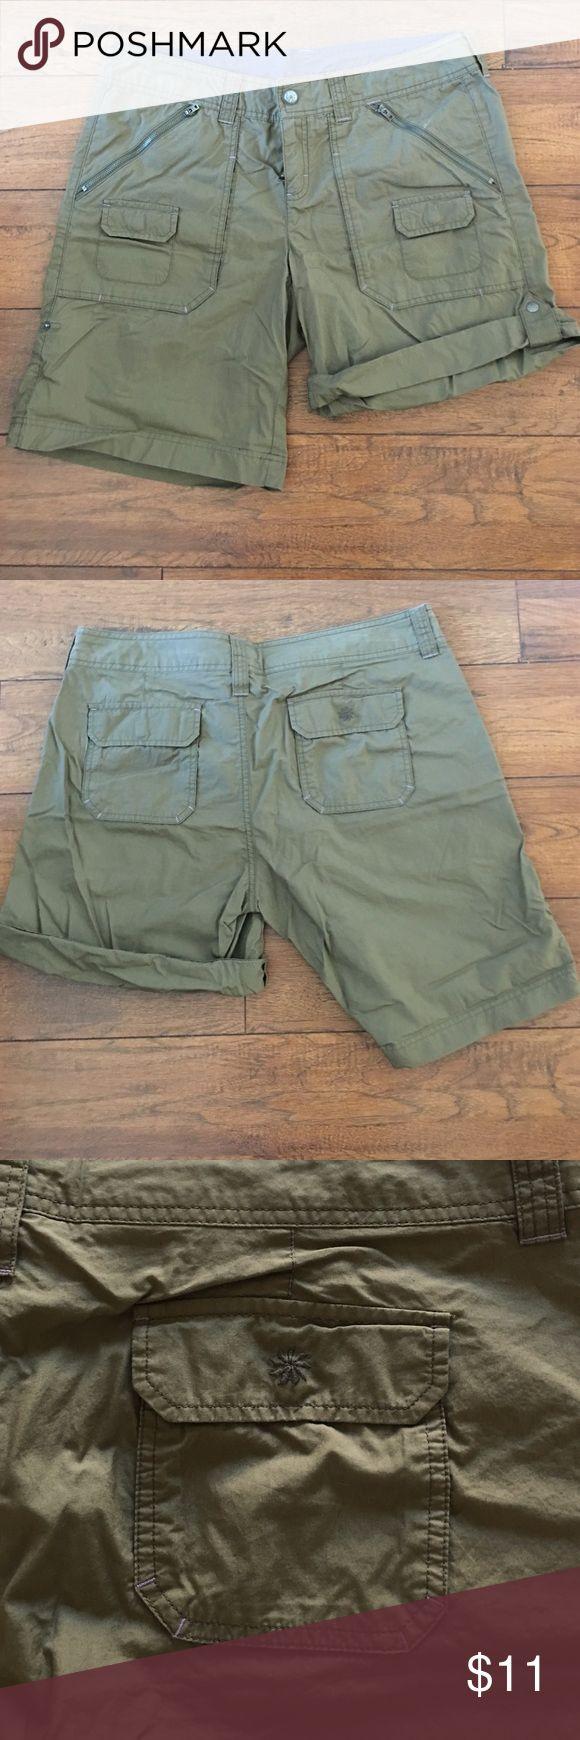 Athleta hiking shorts - NWOT Roll up shorts with plenty of pockets. Light weight and quick drying. Athleta Shorts